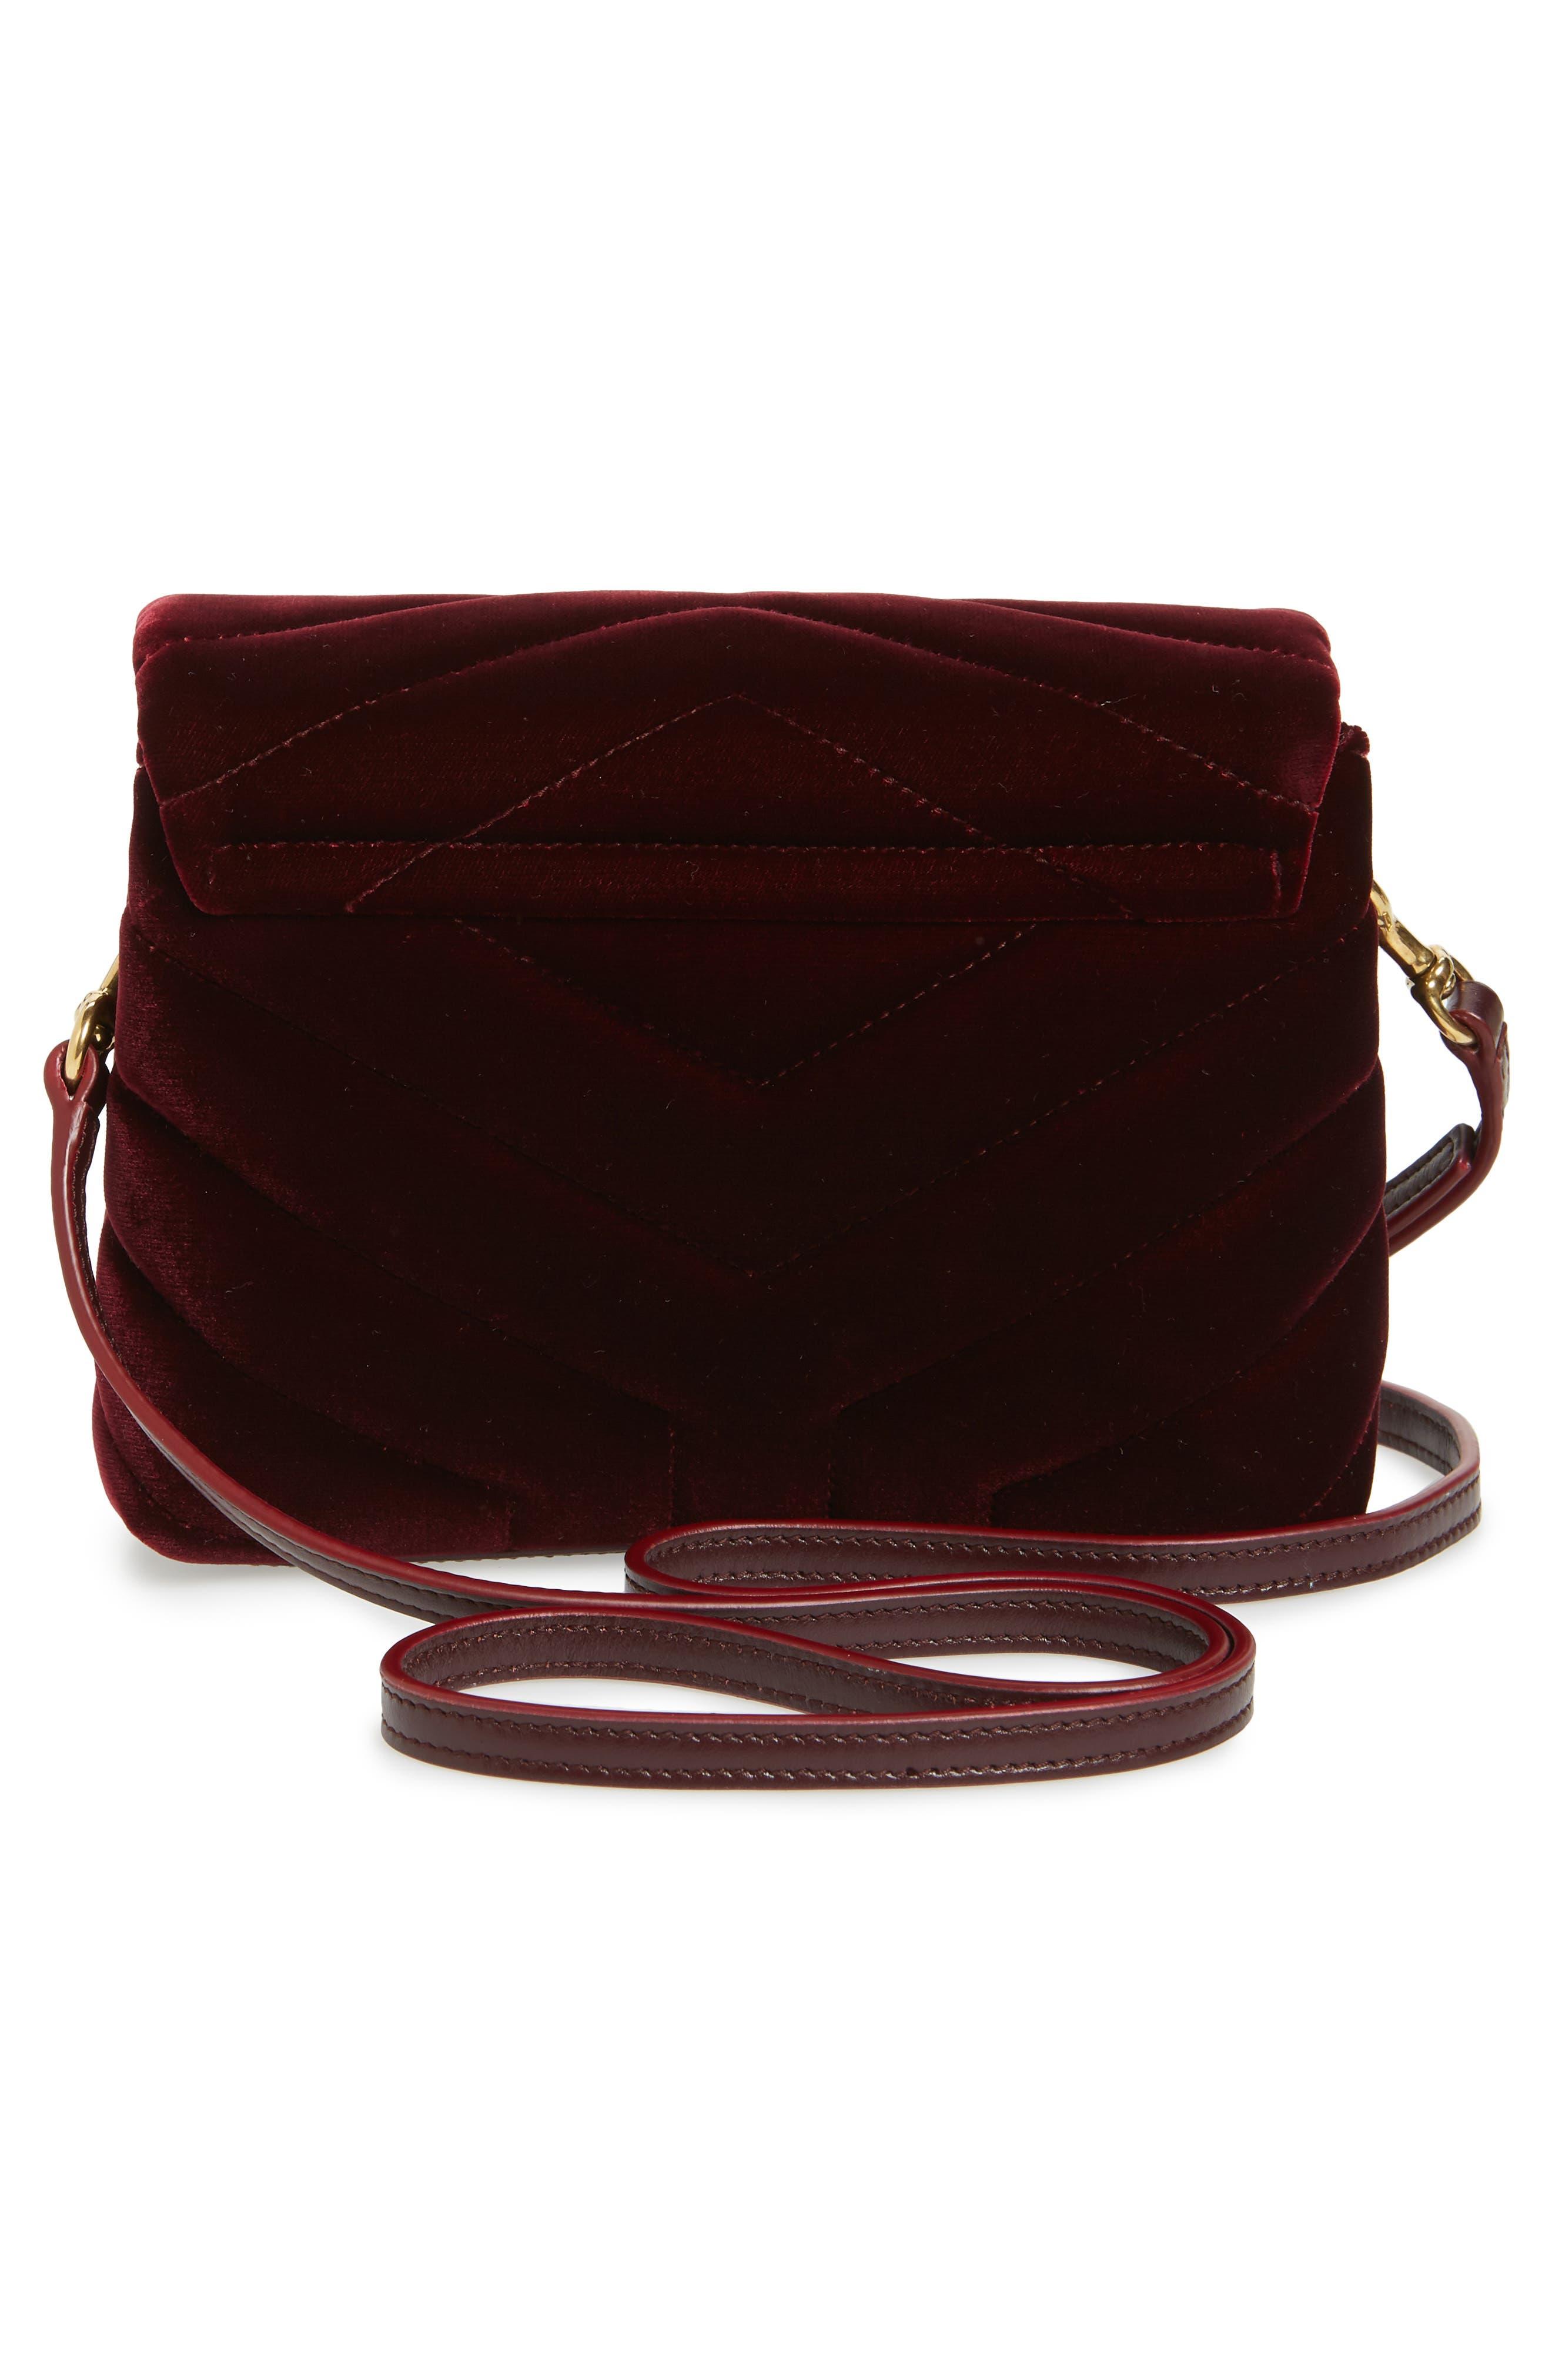 SAINT LAURENT,                             Toy Loulou Velvet Crossbody Bag,                             Alternate thumbnail 3, color,                             930